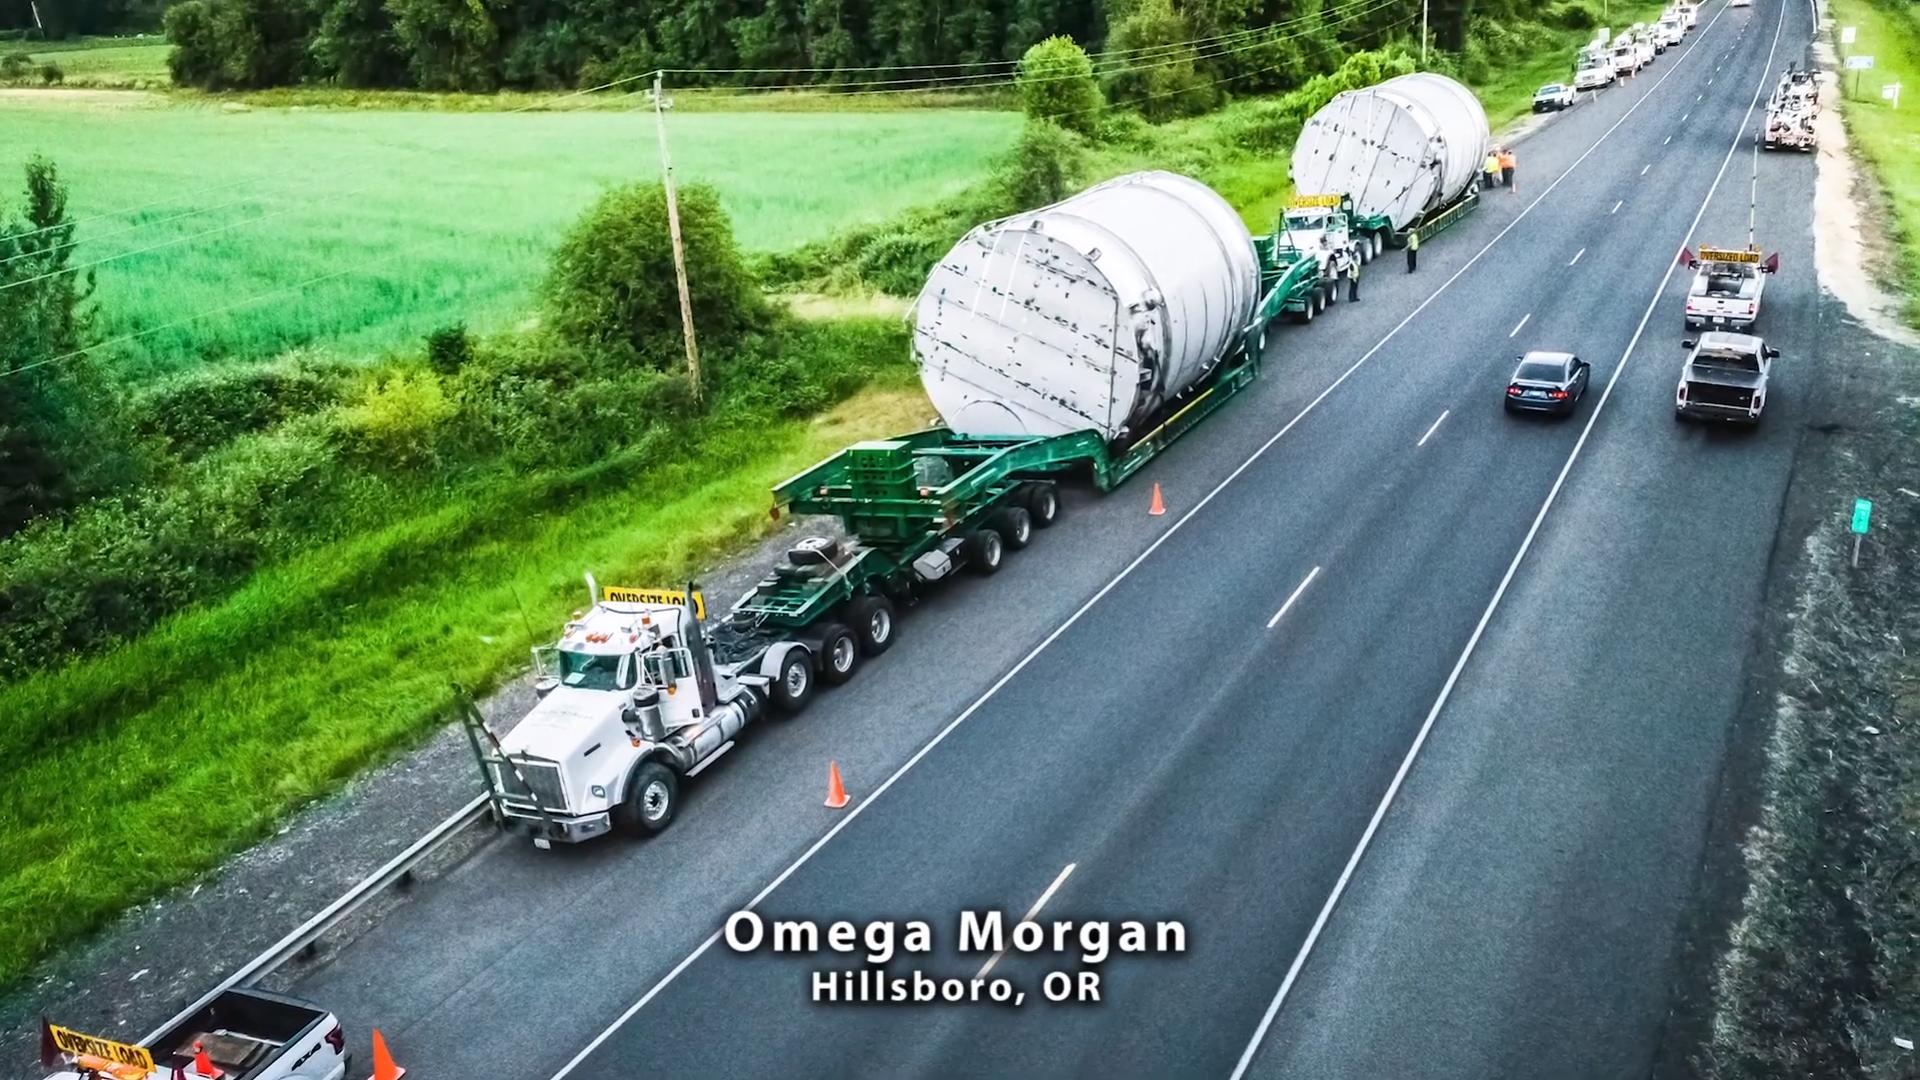 Omega Morgan transporting tanks on the highway